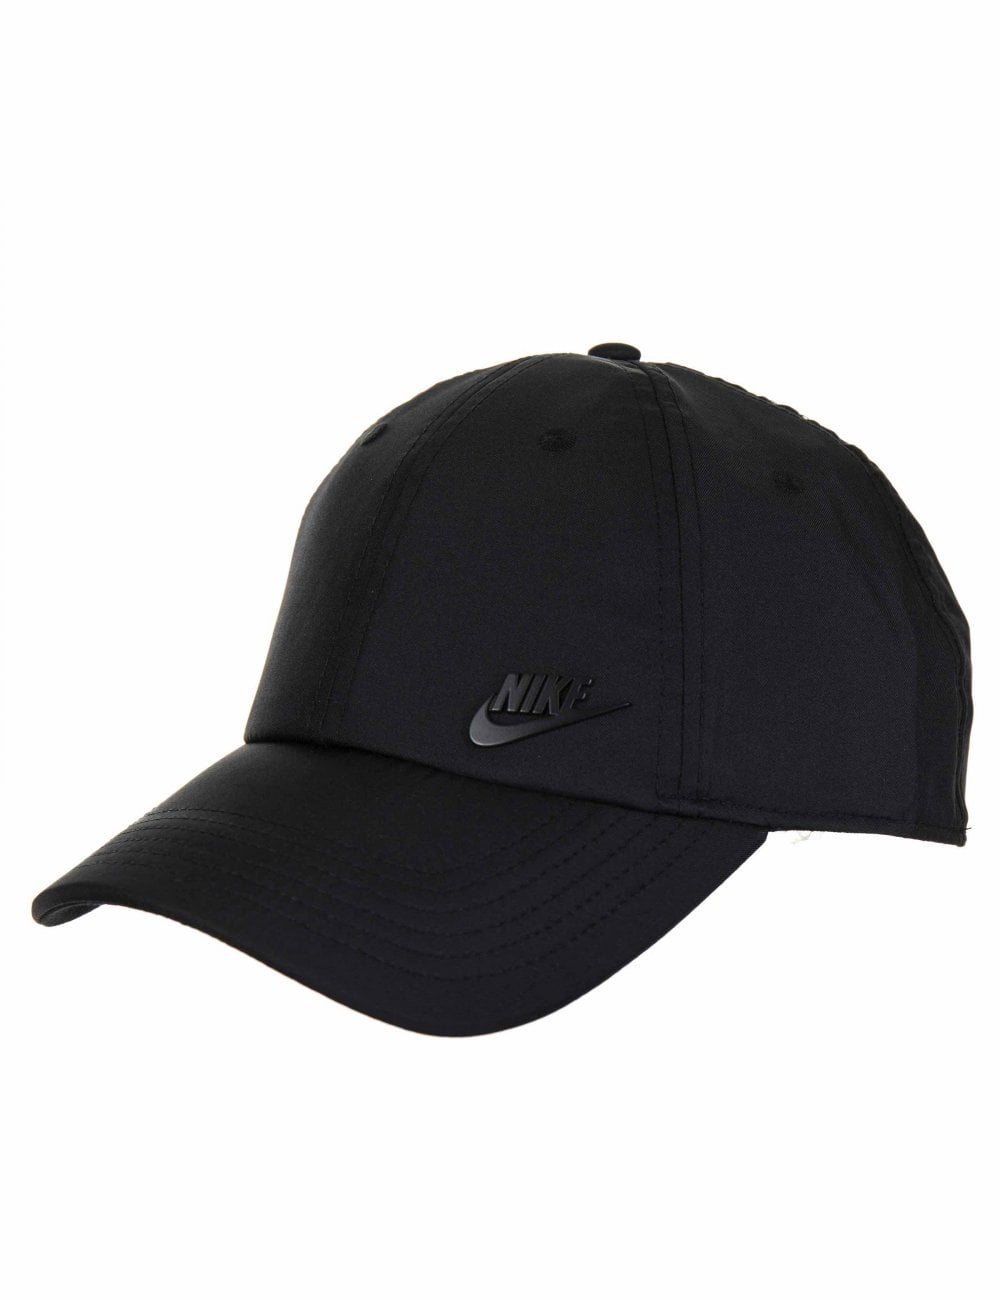 Nike Futura Heritage 86 Aerobill Hat - Black - Hat Shop from Fat ... 8ea25c29c94